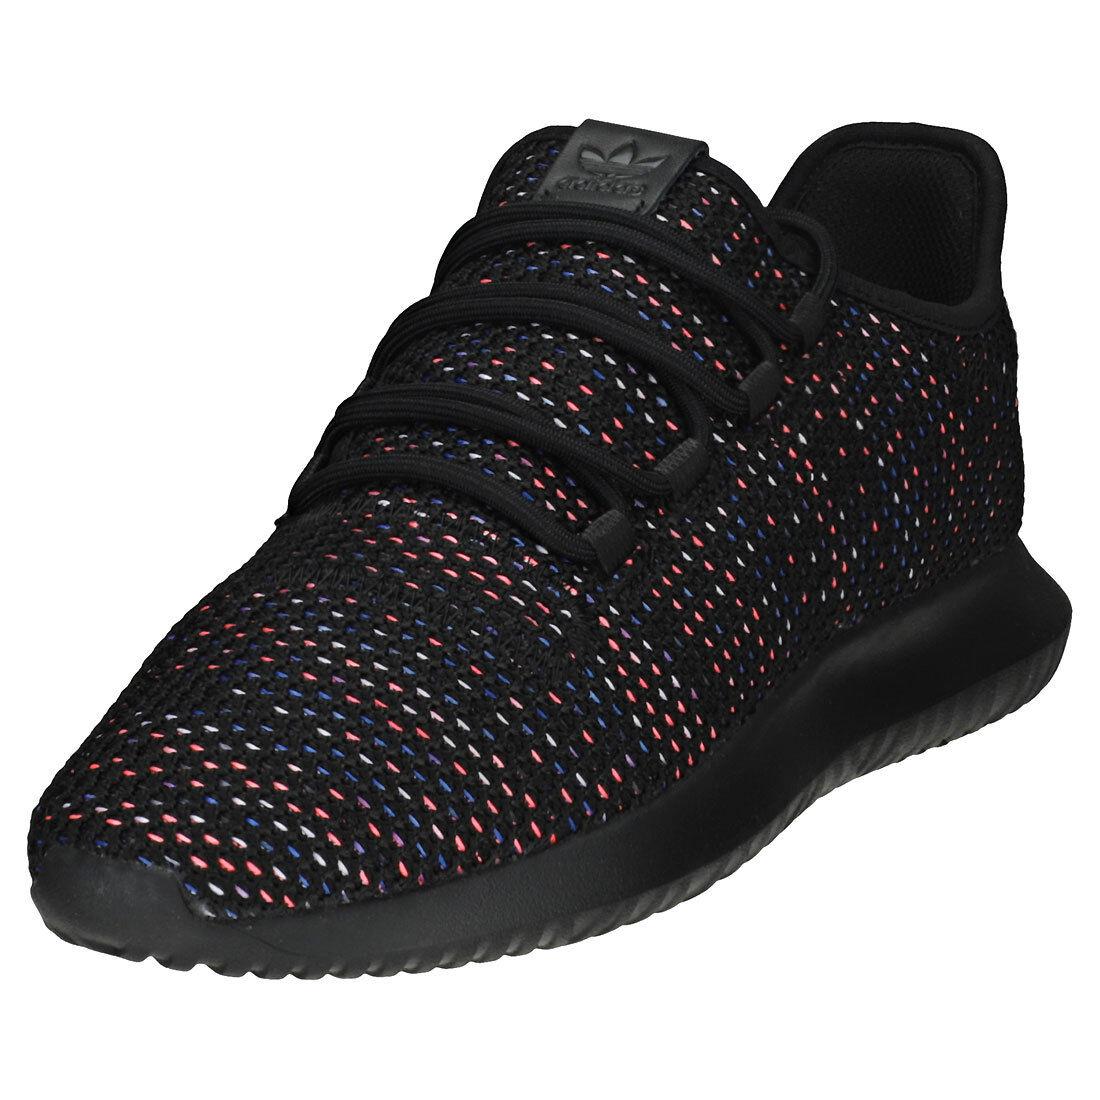 promo code 37115 13bd1 Adidas Adidas Adidas tubular Shadow CK homme noir multicolore Mesh    Textile Baskets 6eac49